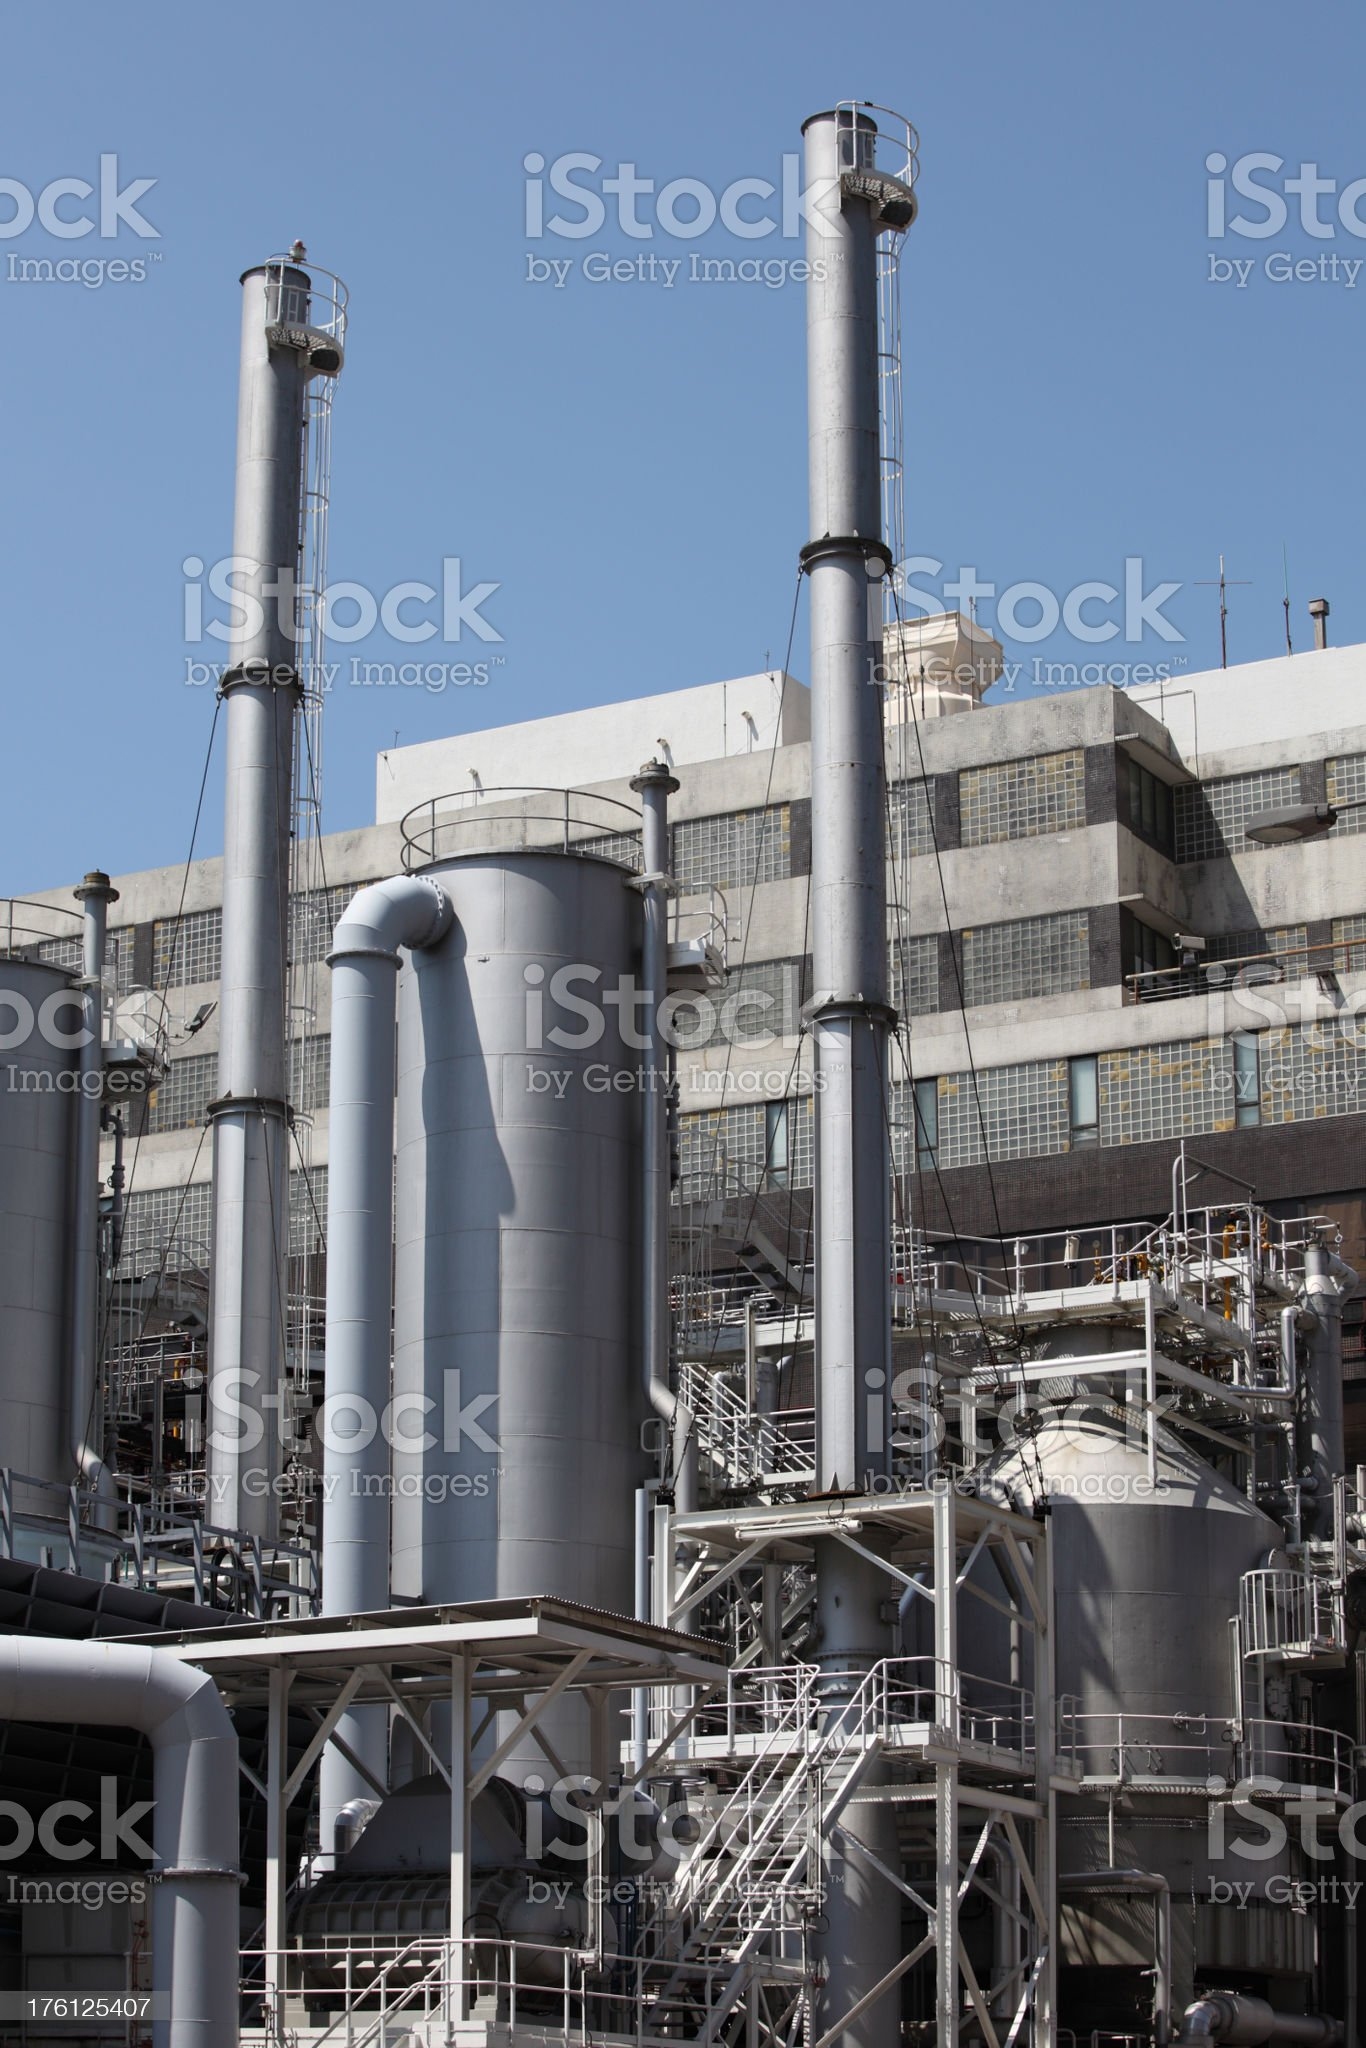 Modern Industry (XXXL) royalty-free stock photo